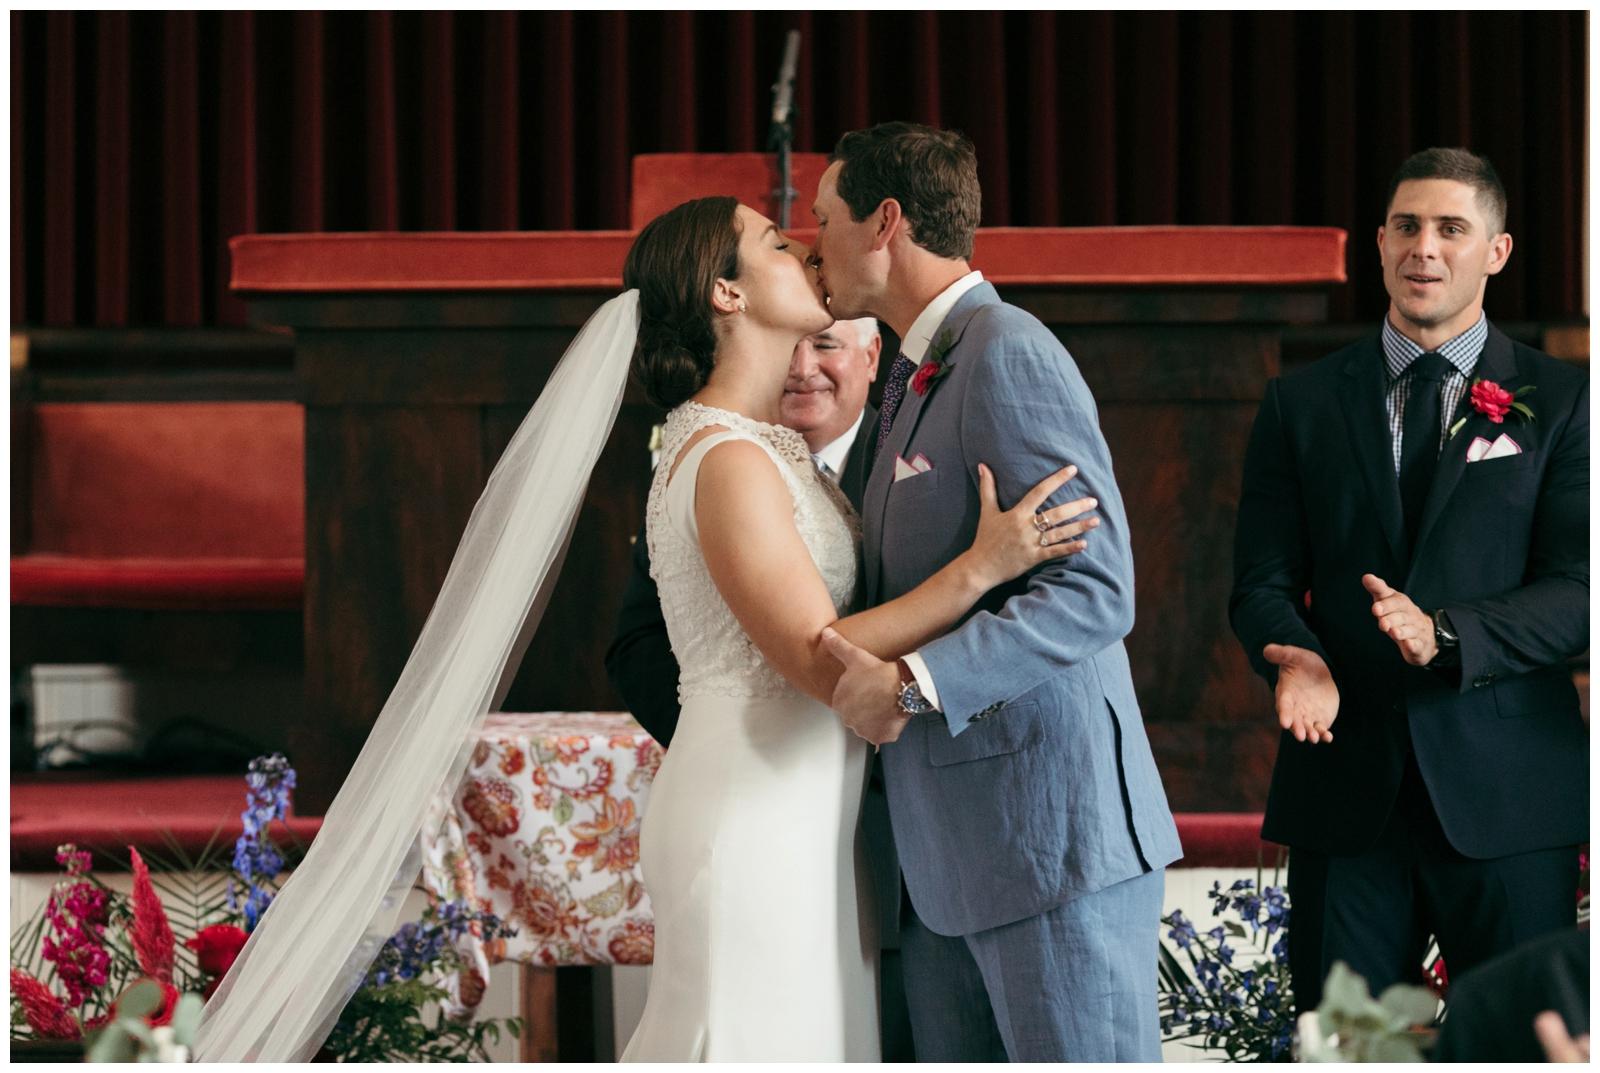 Bailey-Q-Photo-Backyard-Wedding-South-Shore-Boston-Wedding-Photographer-052.jpg